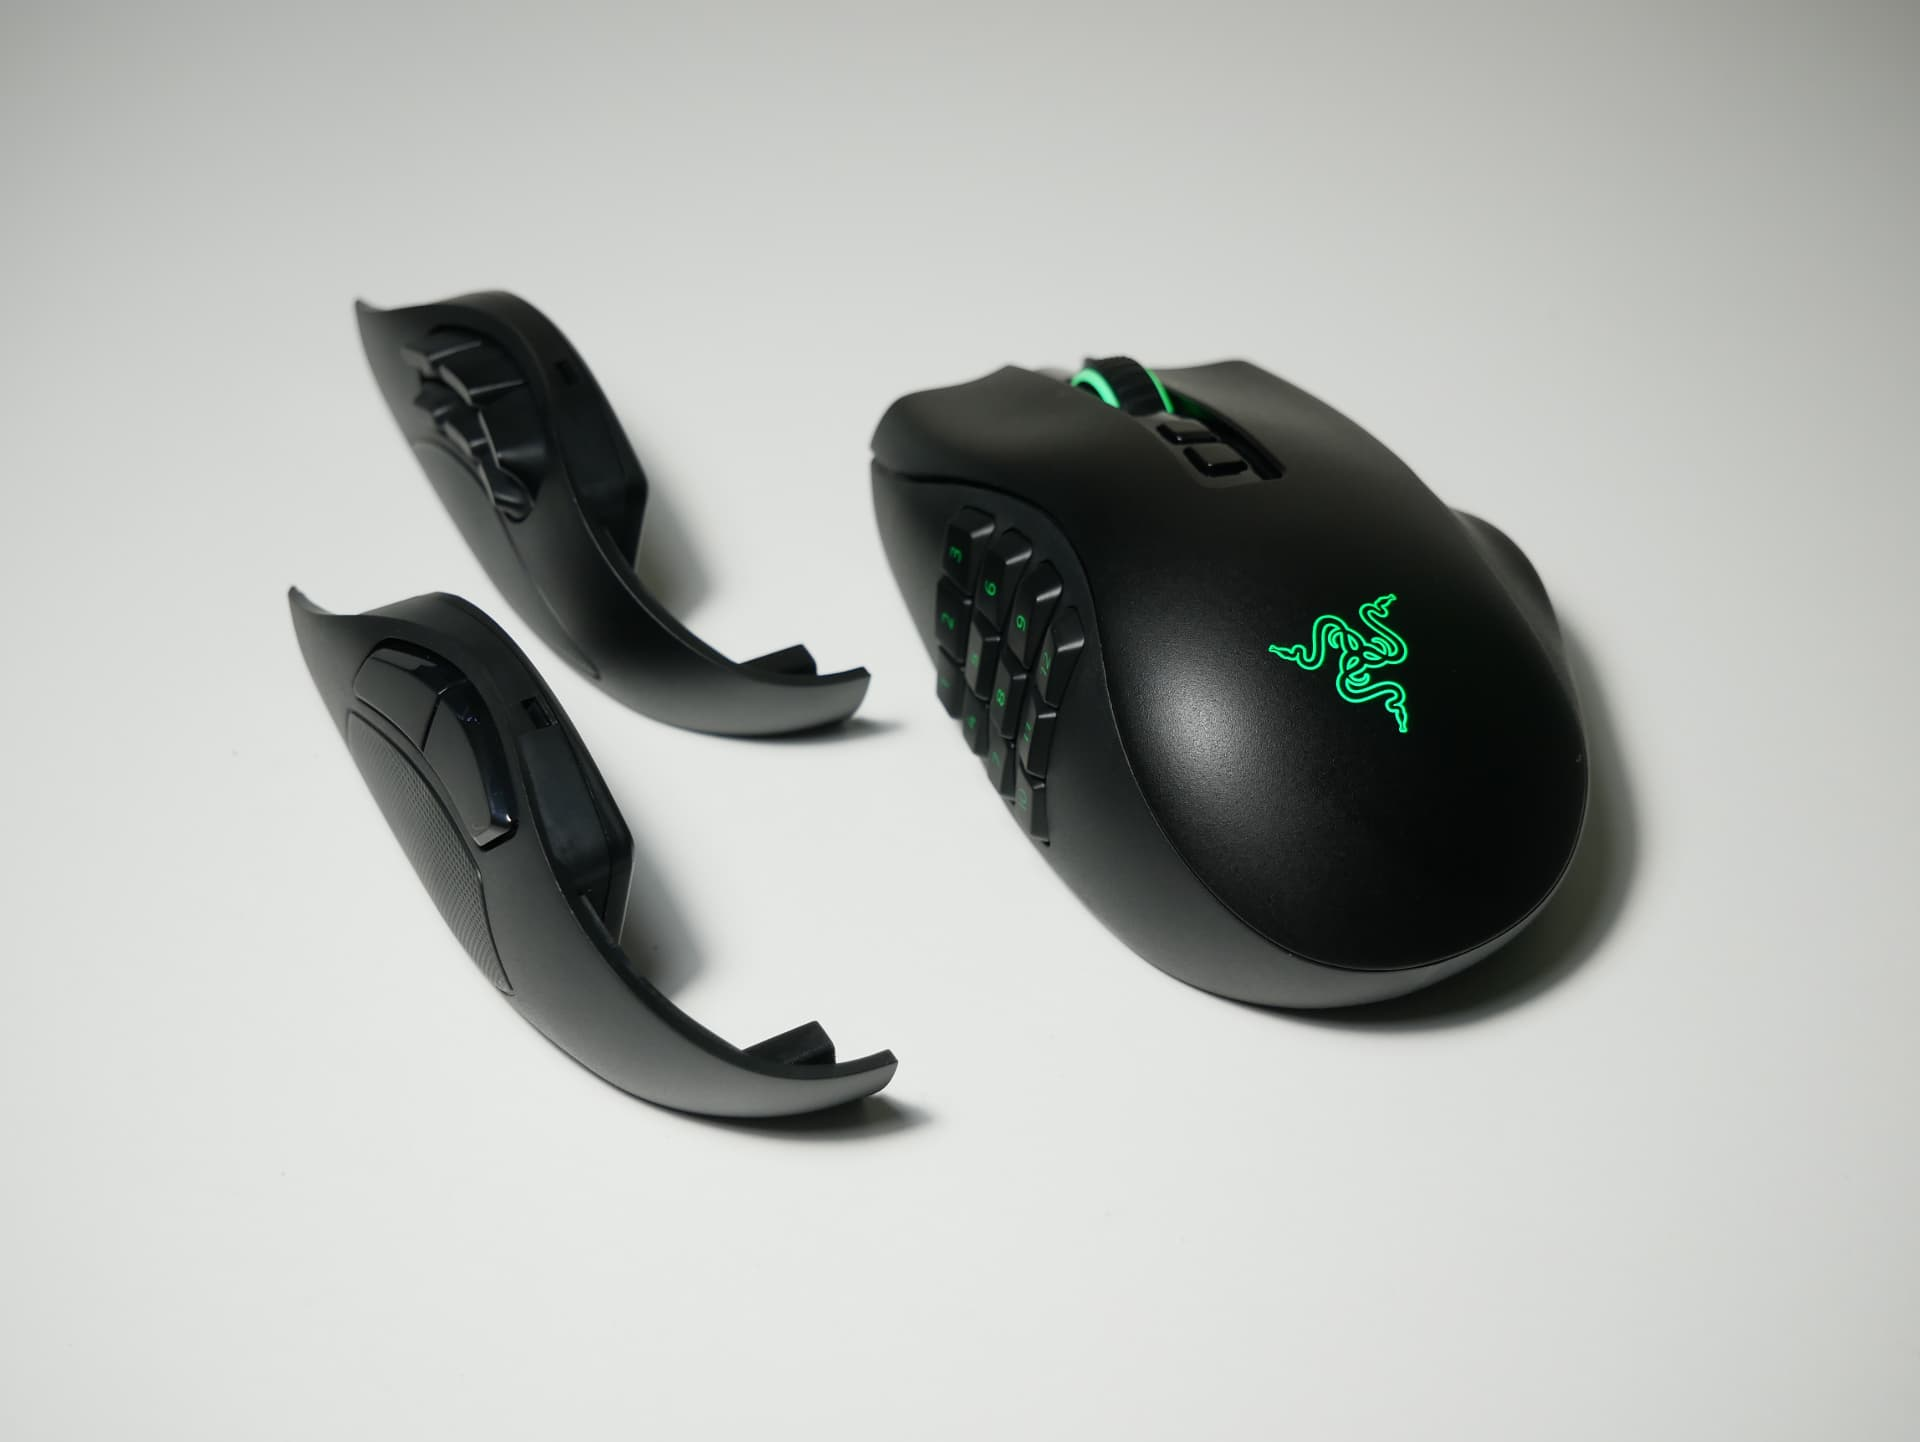 「Razer Naga Pro」レビュー。サイドプレート交換によって複数ジャンルに対応する無線ゲーミングマウス